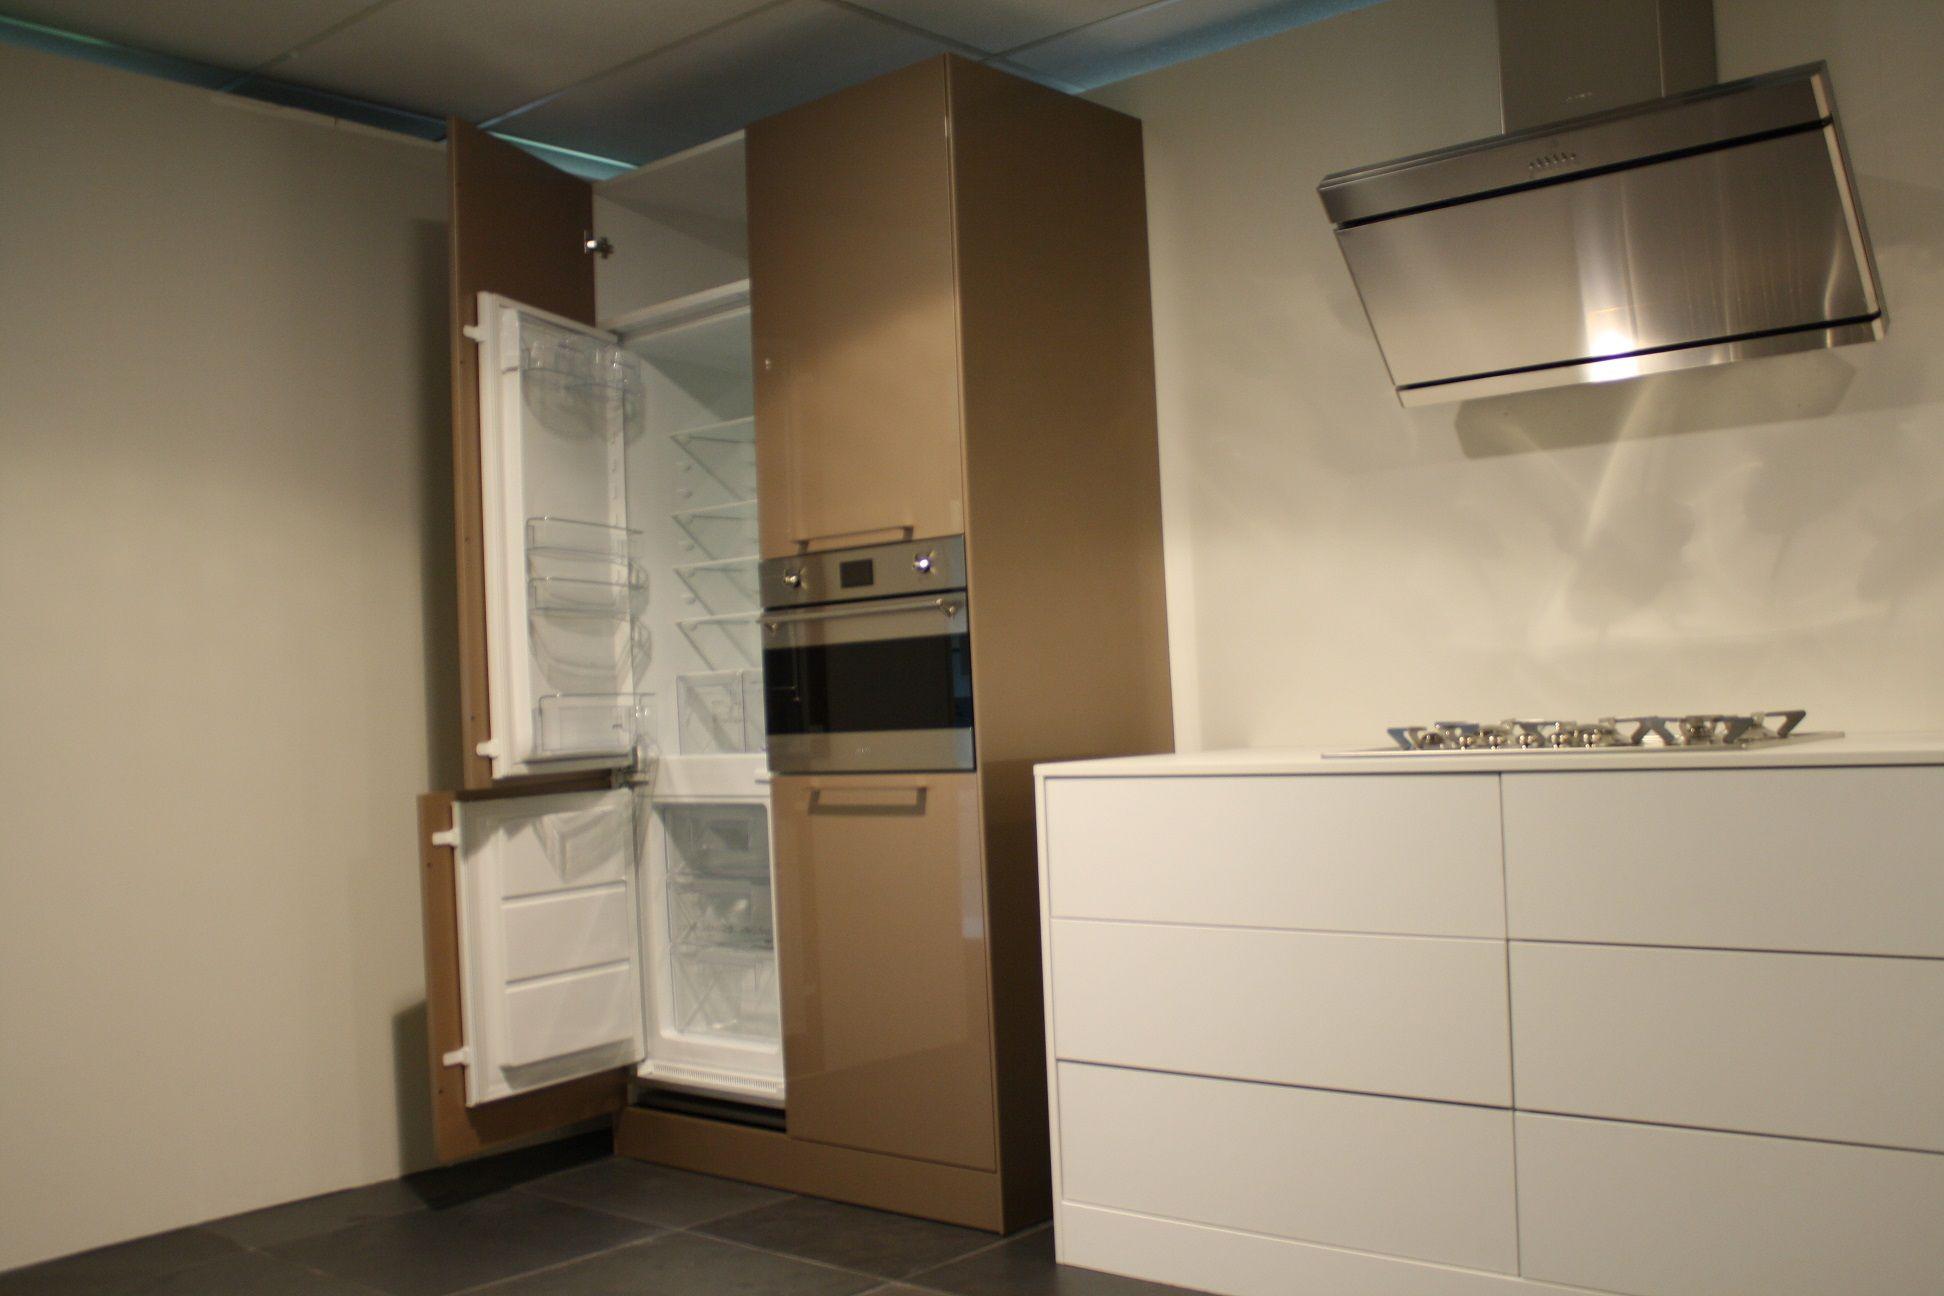 Keukenprijs altijd de beste keukenprijs greeploze witte keuken 48196 - Witte keukens ...